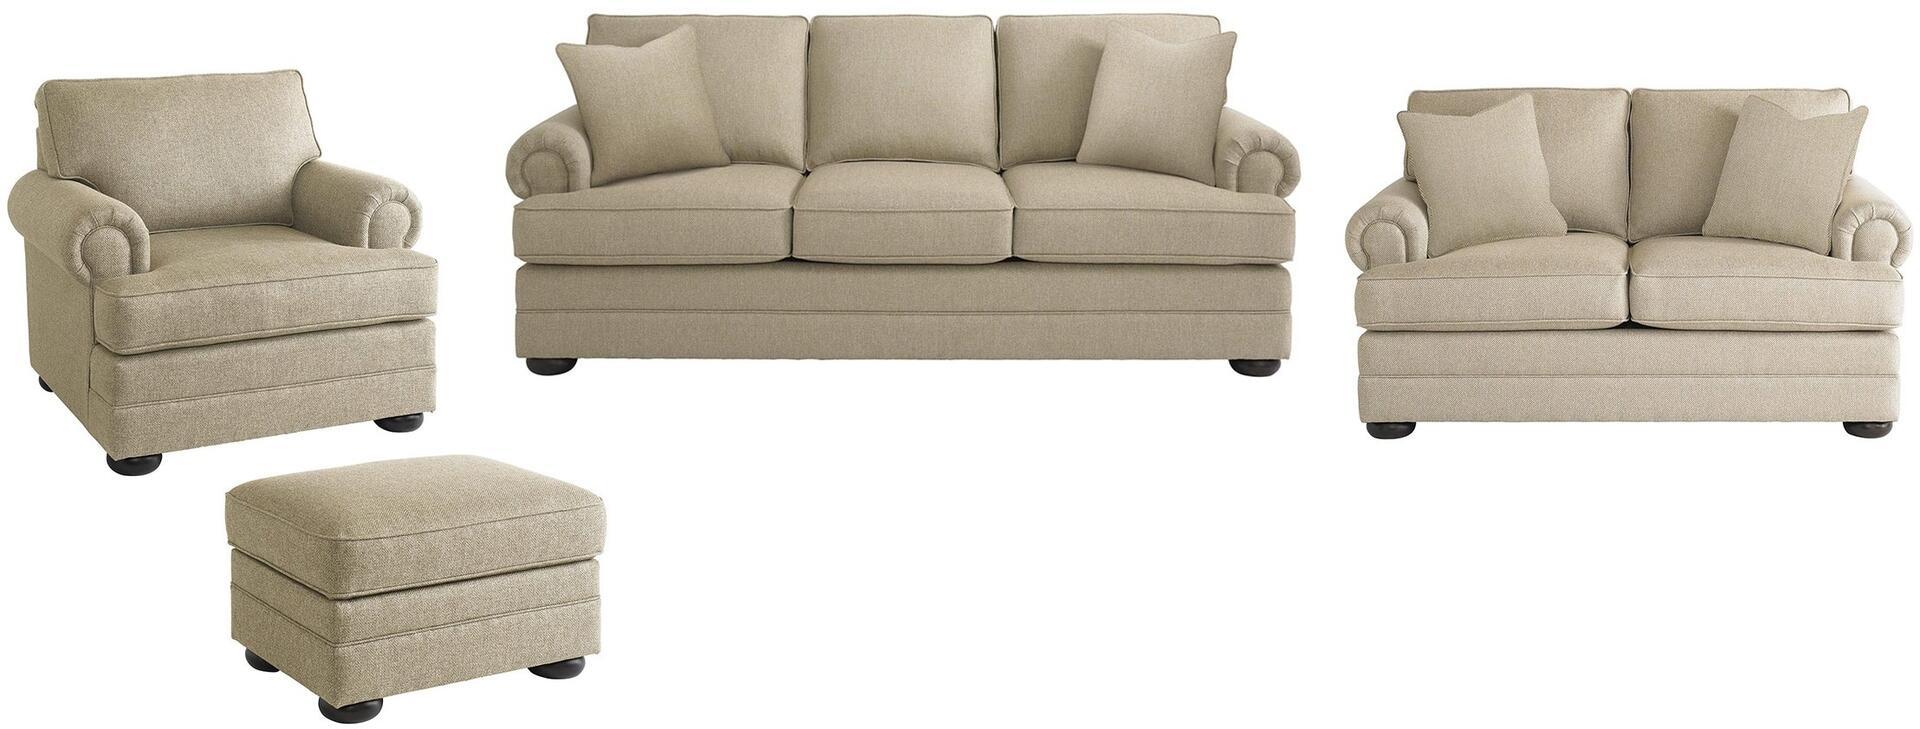 bassett furniture 3913fcfc1611slco hyde park living room set appliances connection